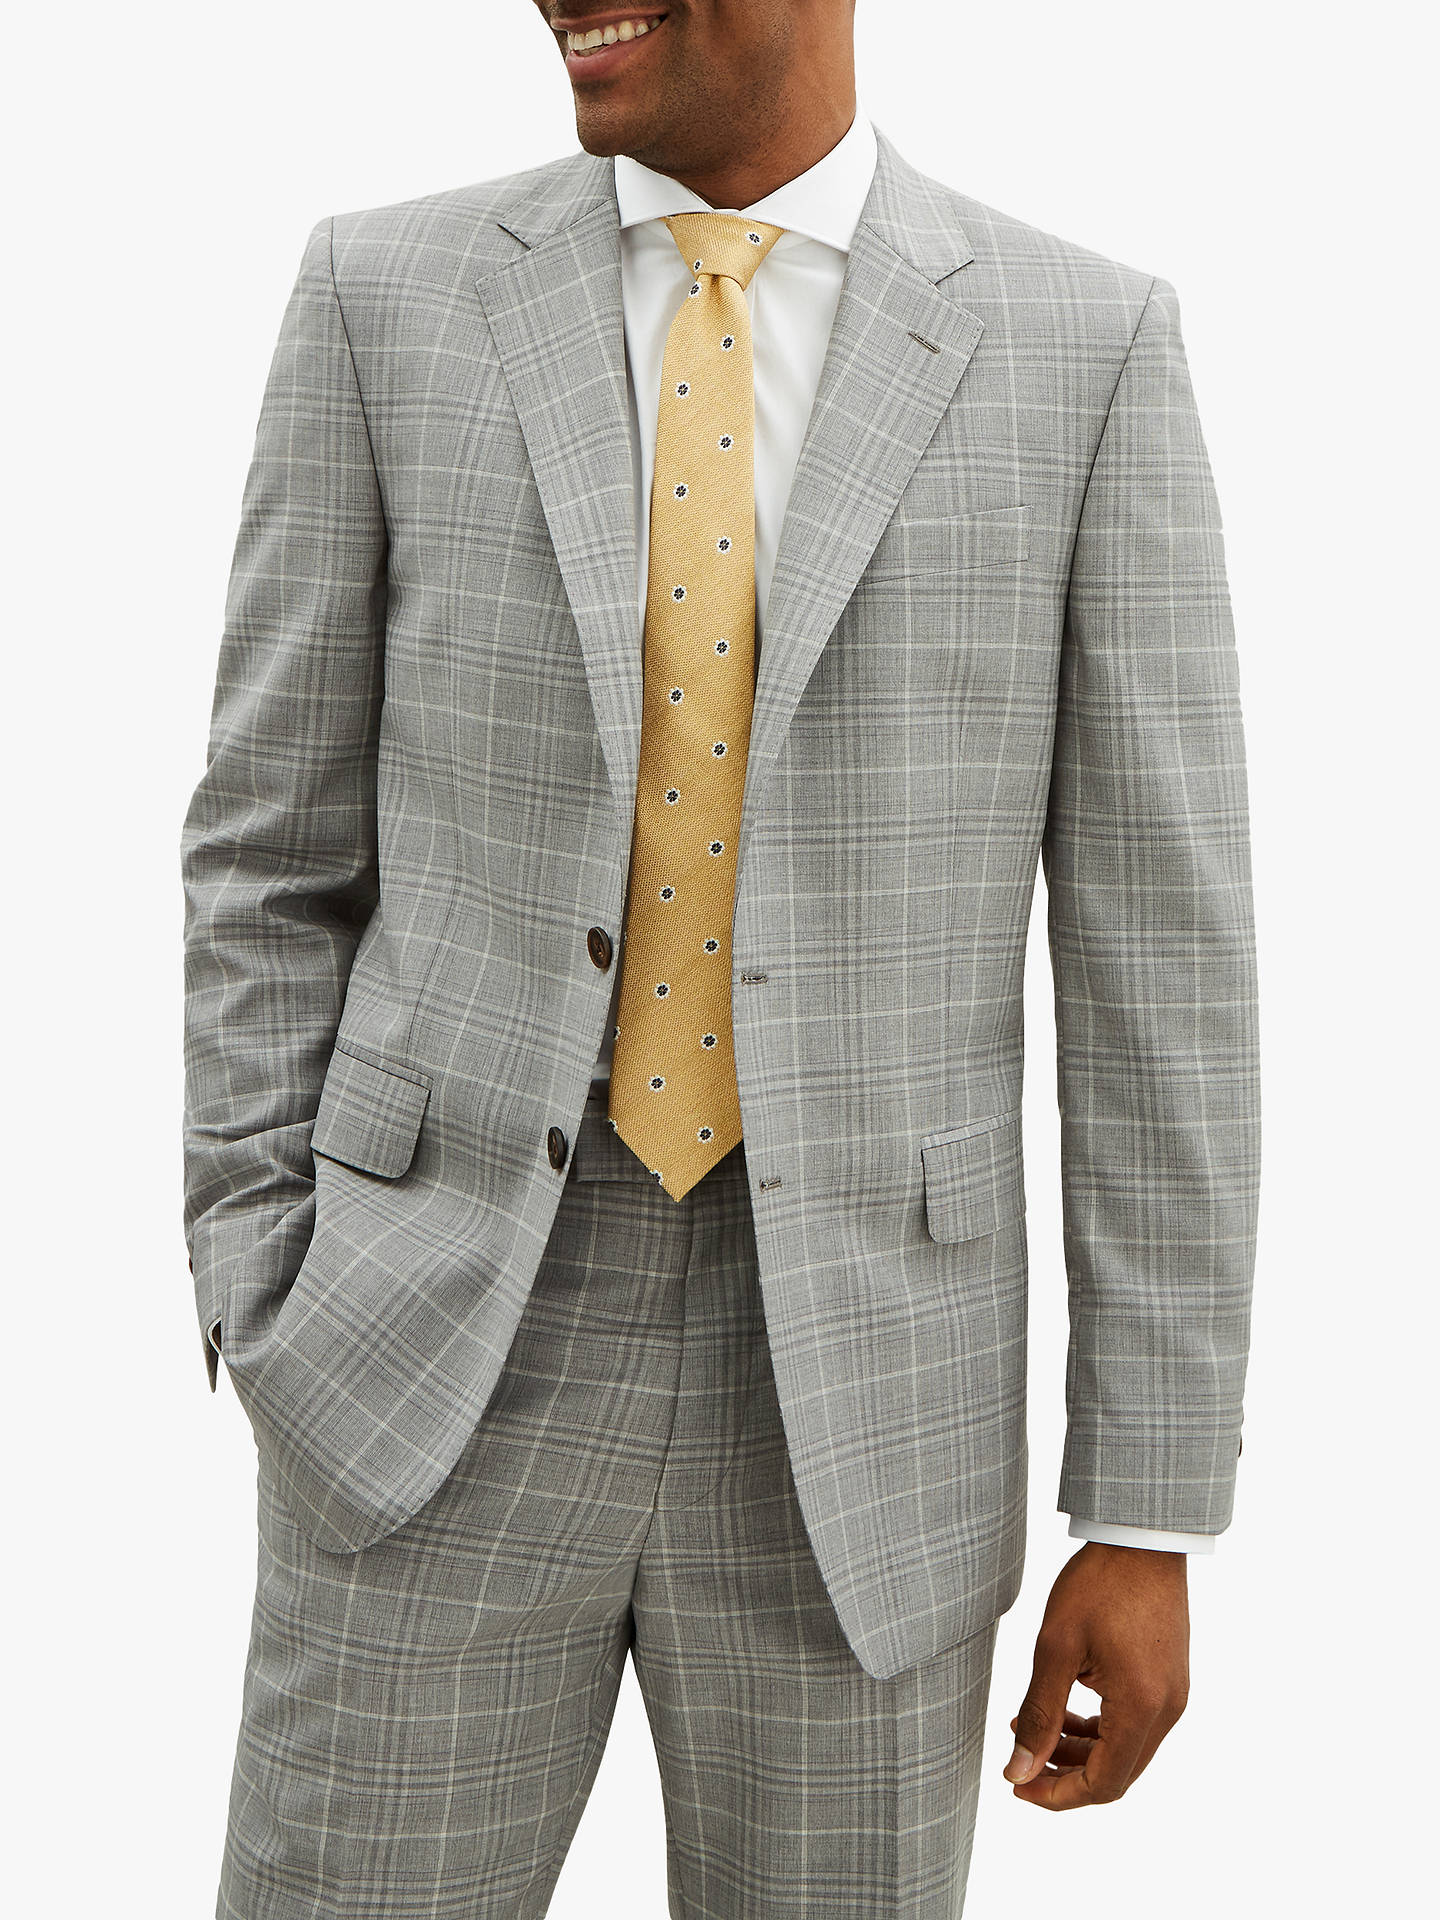 4ecc5c8163cf Buy Jaeger Wool Check Regular Suit Jacket, Light Grey, 36R Online at  johnlewis.